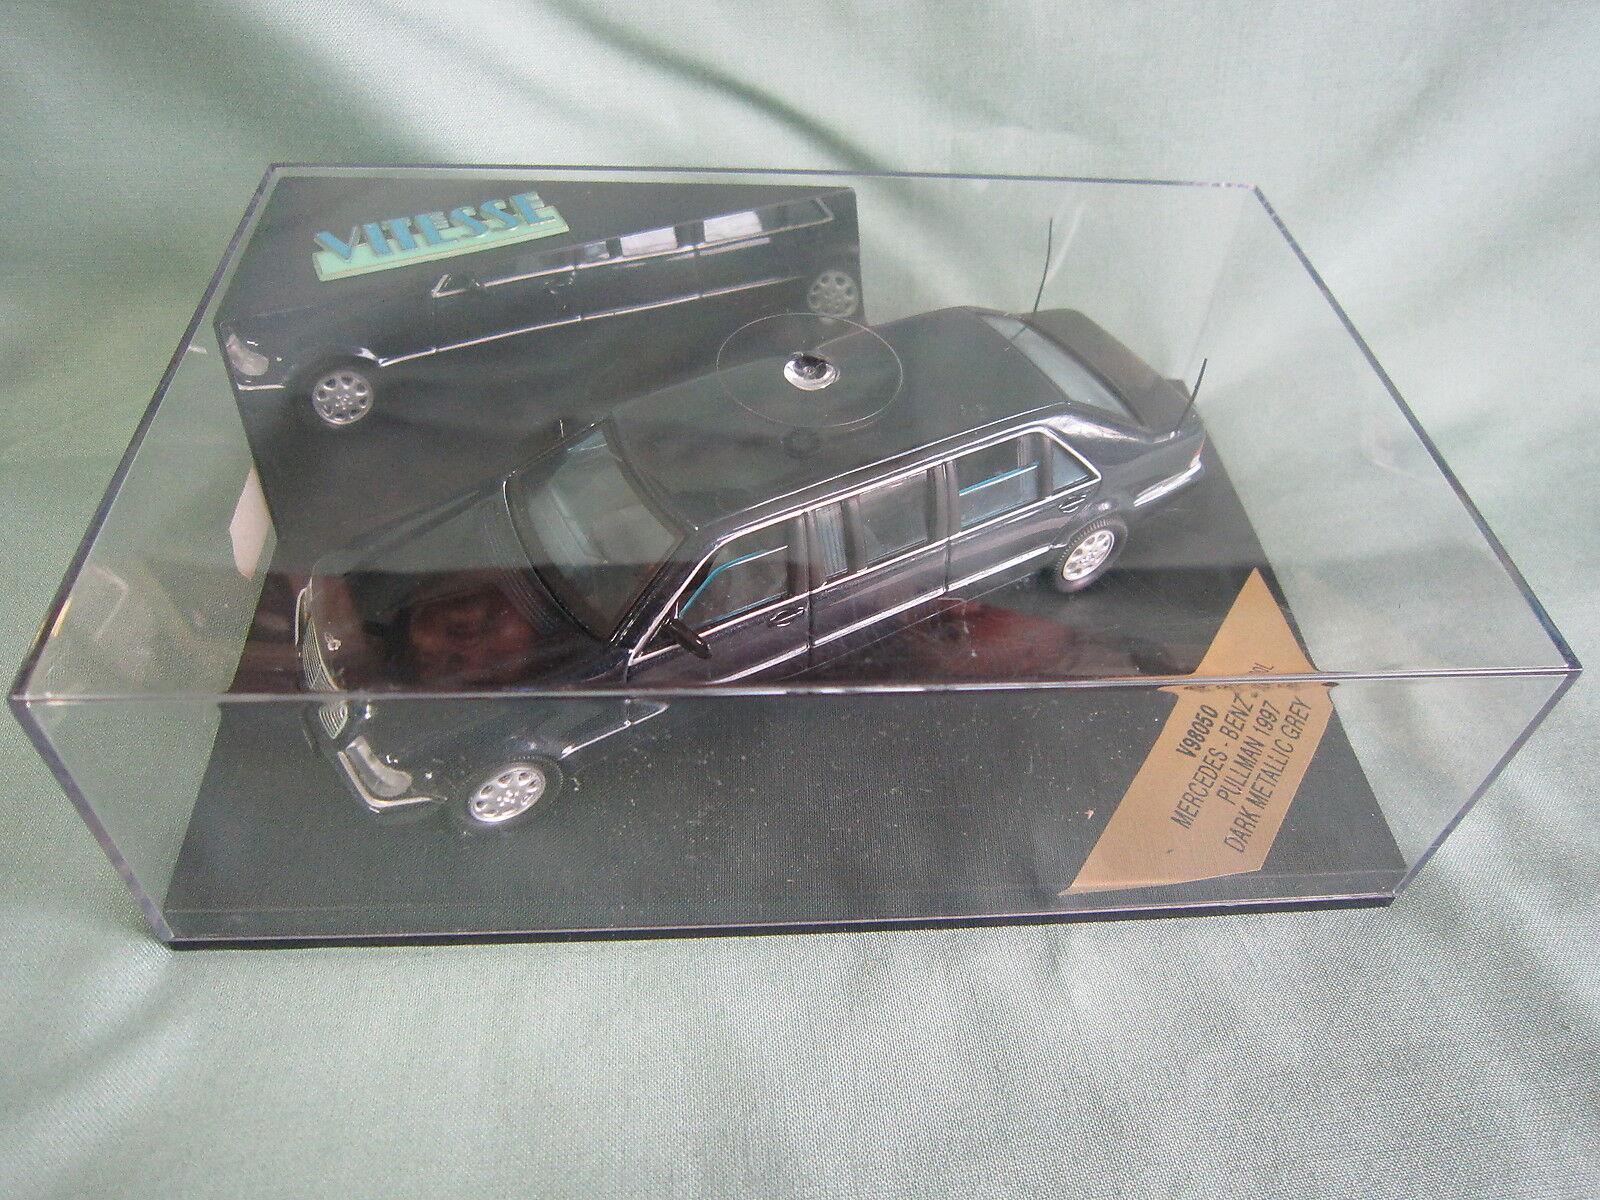 promociones DV5874 DV5874 DV5874 VITESSE MERCEDES BENZ S600L PULLMAN 1997 DARK Ref V98050 Ed lim 1 43 BOX  barato y de alta calidad